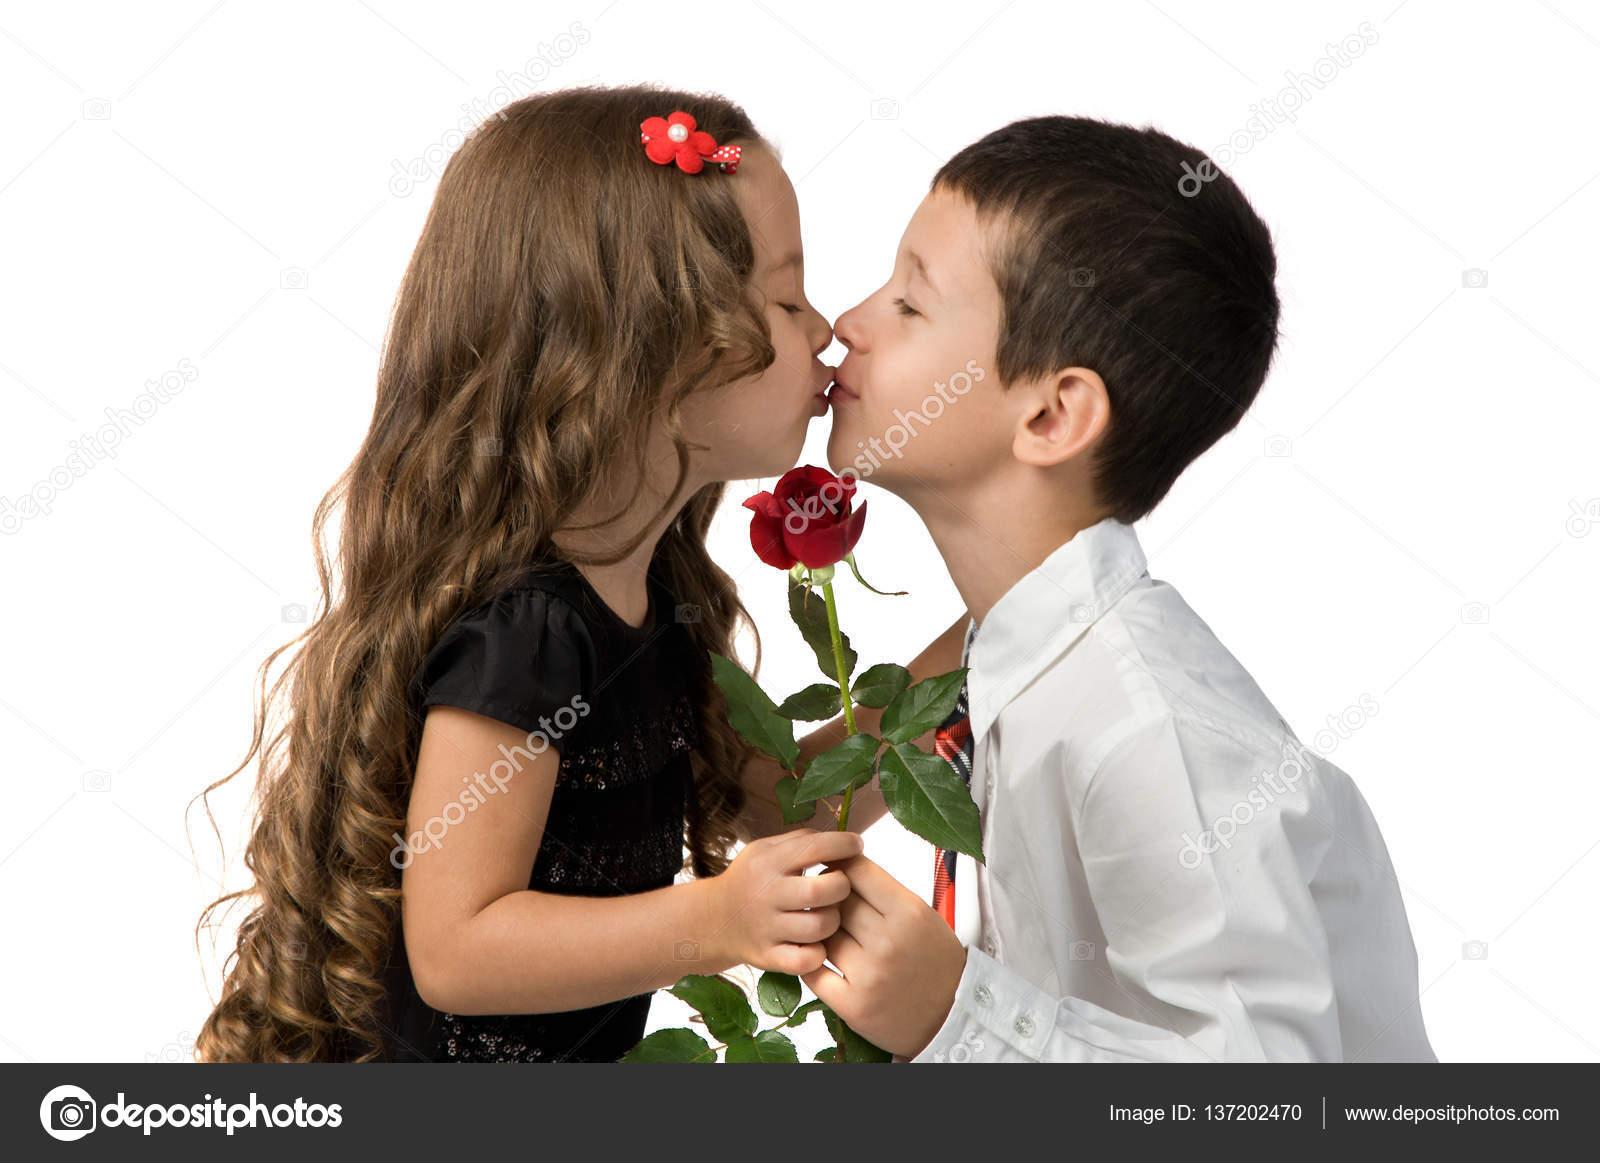 Поцелуй между двумя девушками